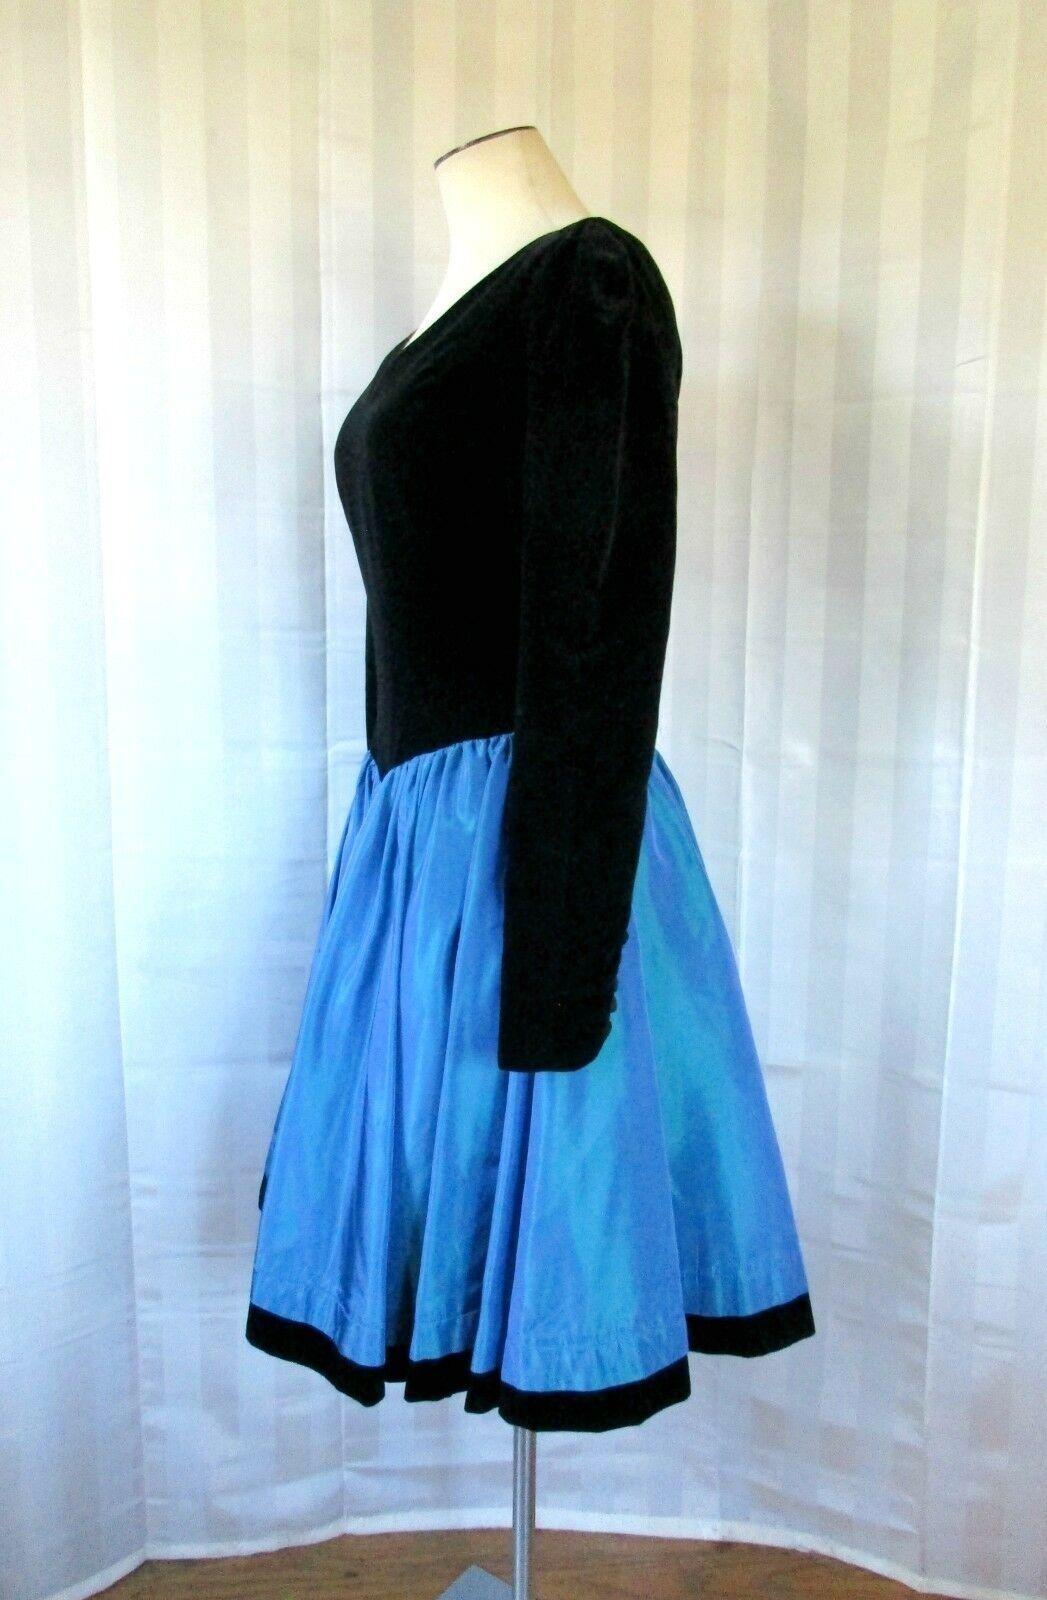 Vintage Laura Ashley Party Dress 1980s 1990s Blac… - image 2